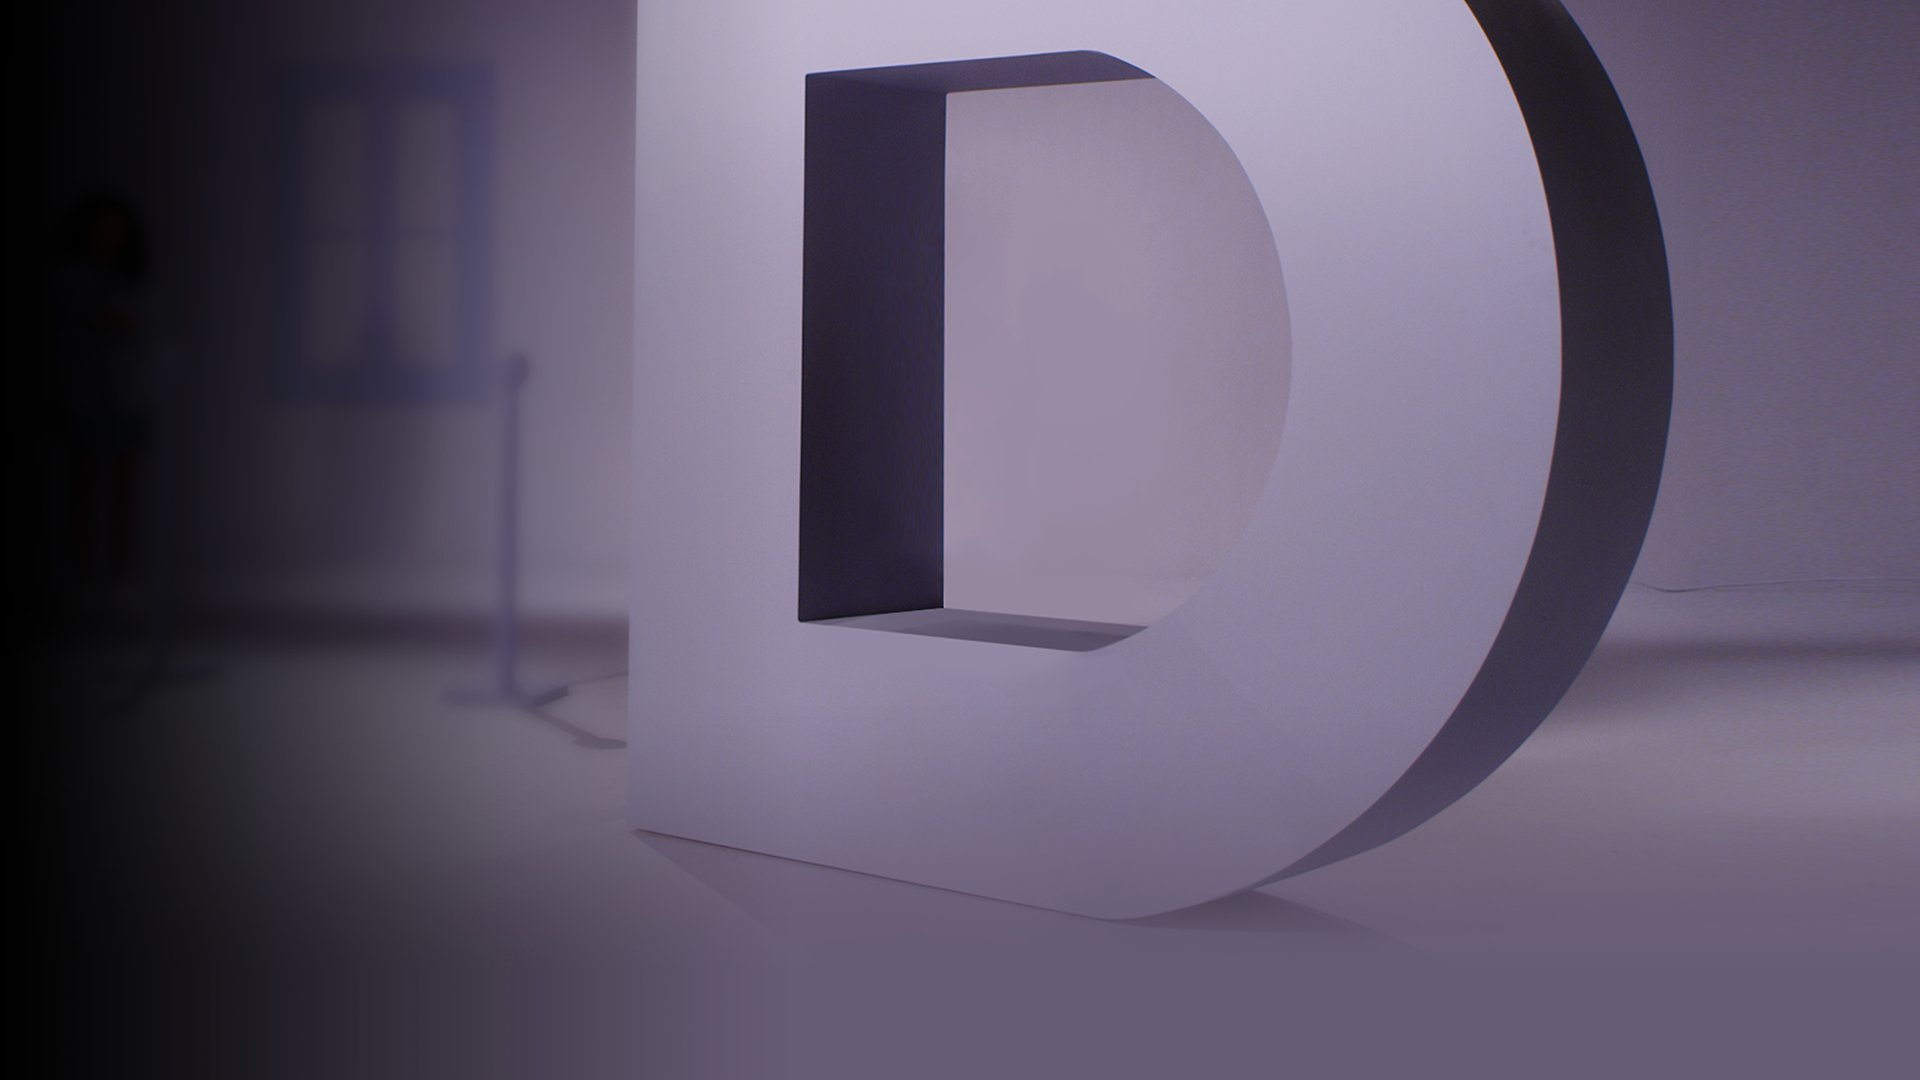 fond D comme Diriger – Avec Denis Brogniart